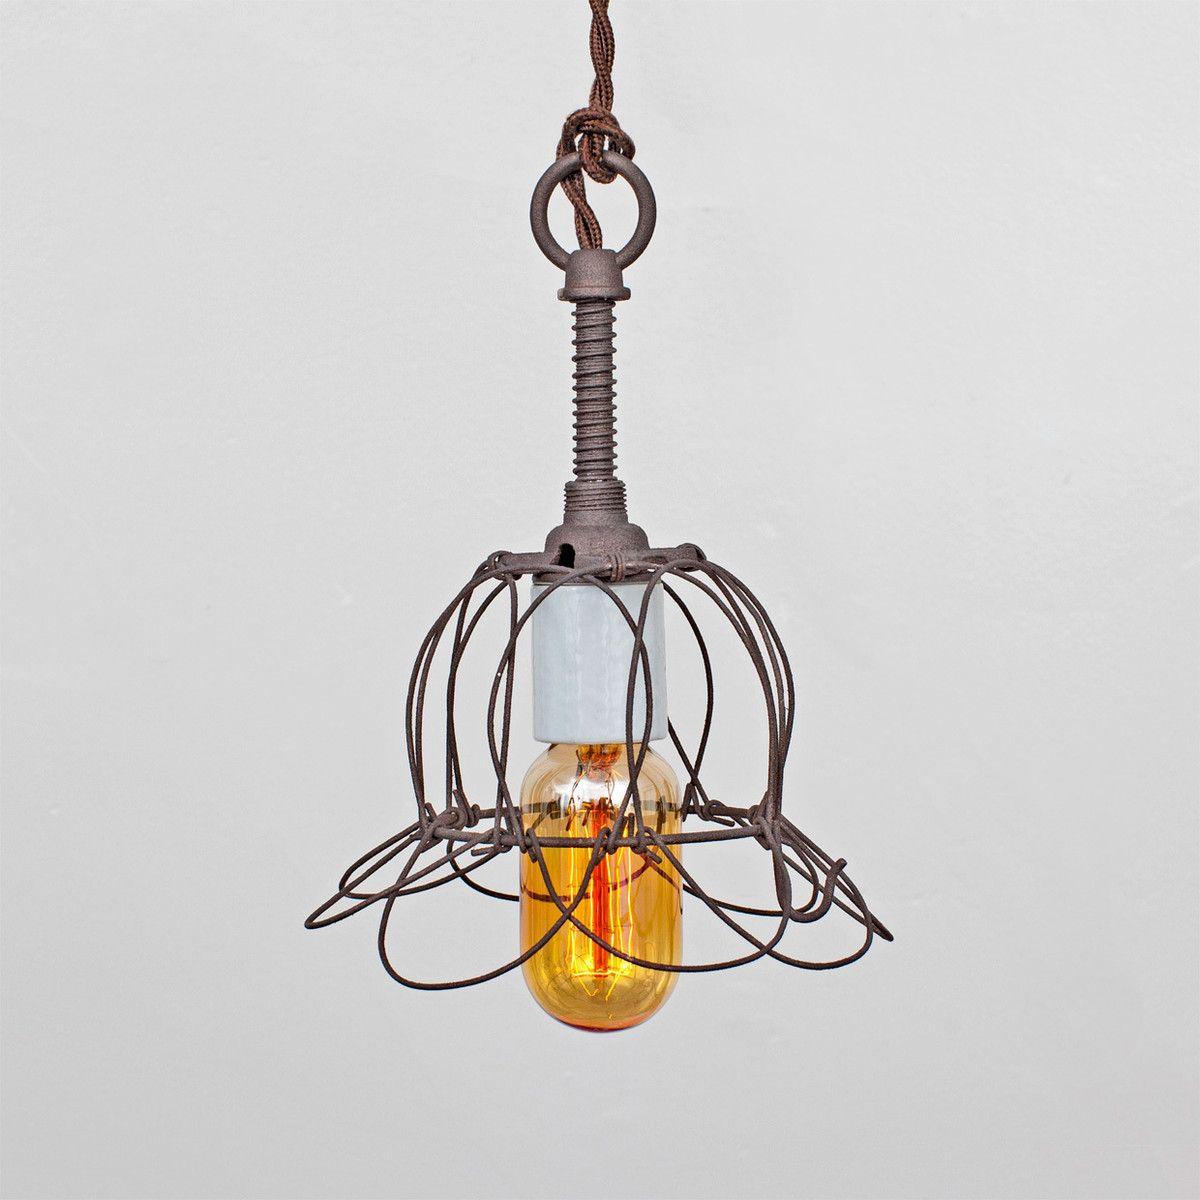 Fab trouble pendant tulip cageflea market rx home